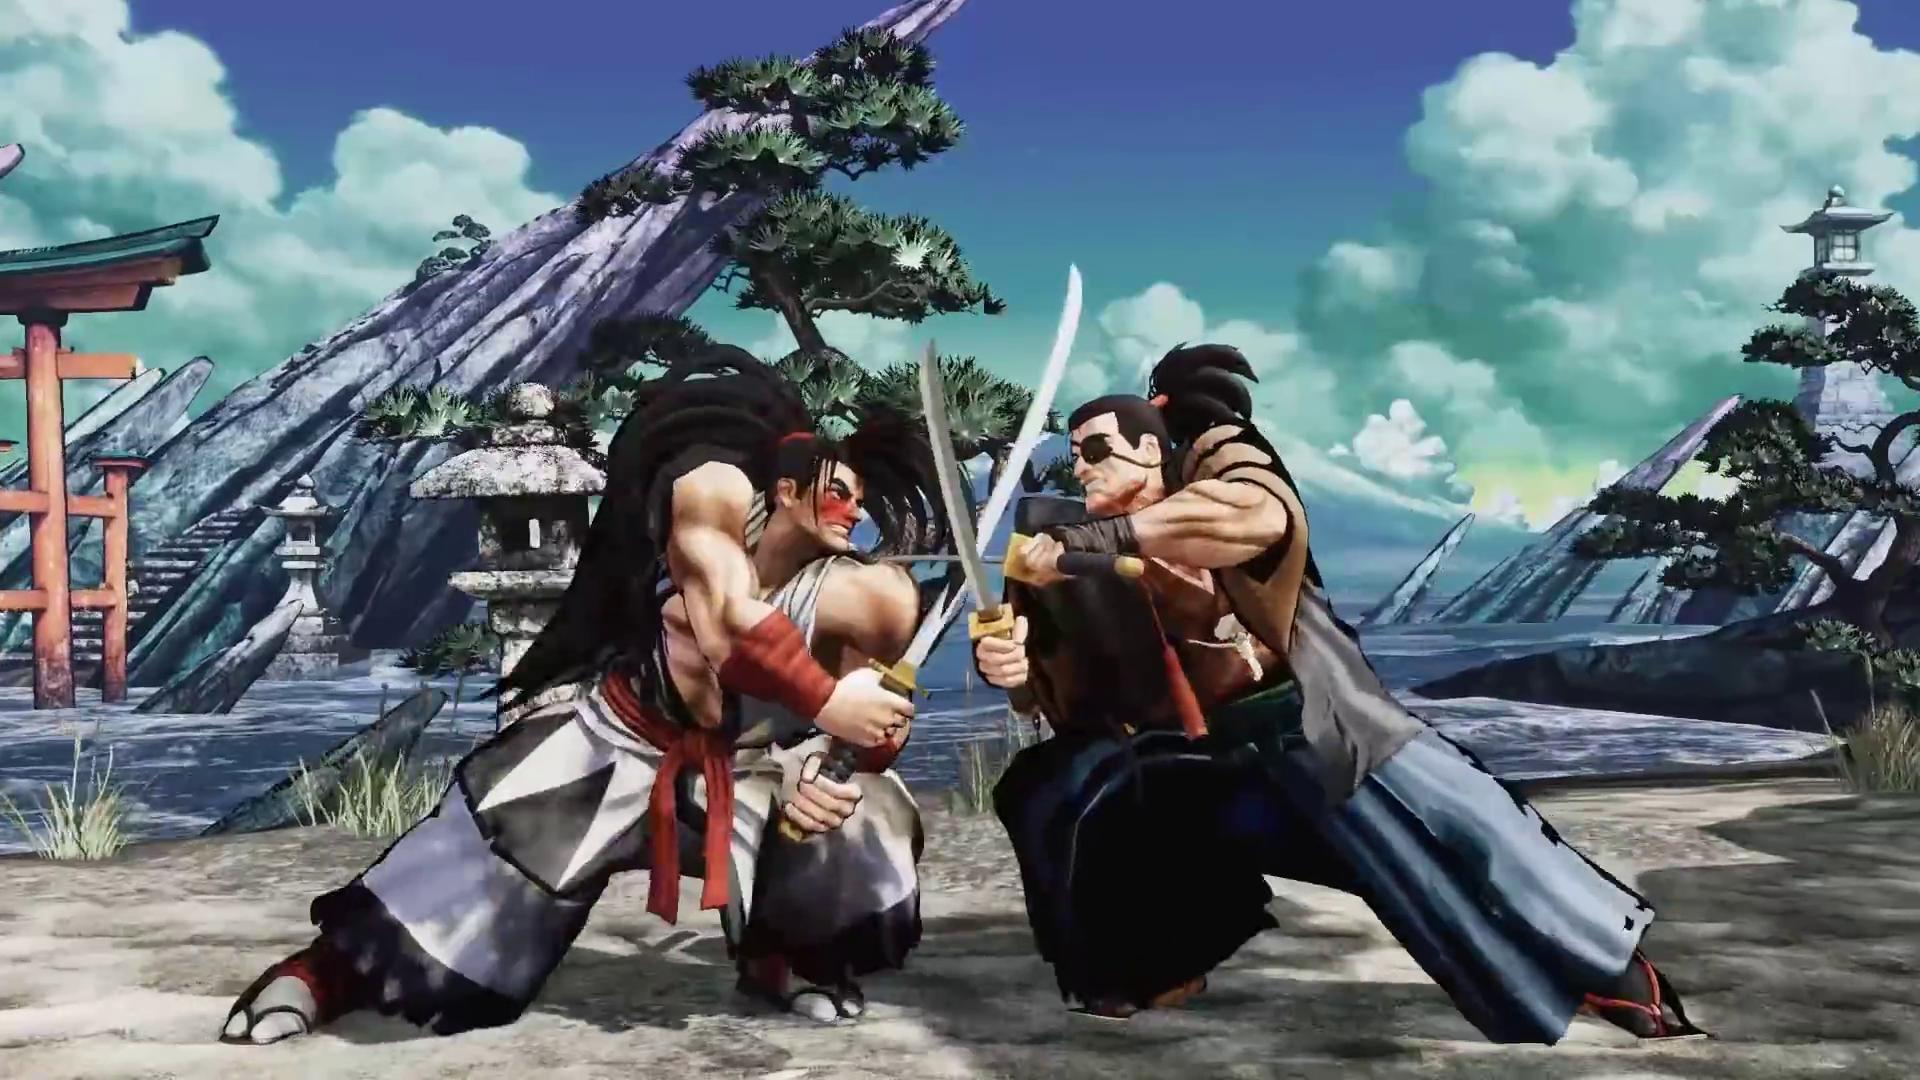 samurai shodown release date switch pc xo ps4